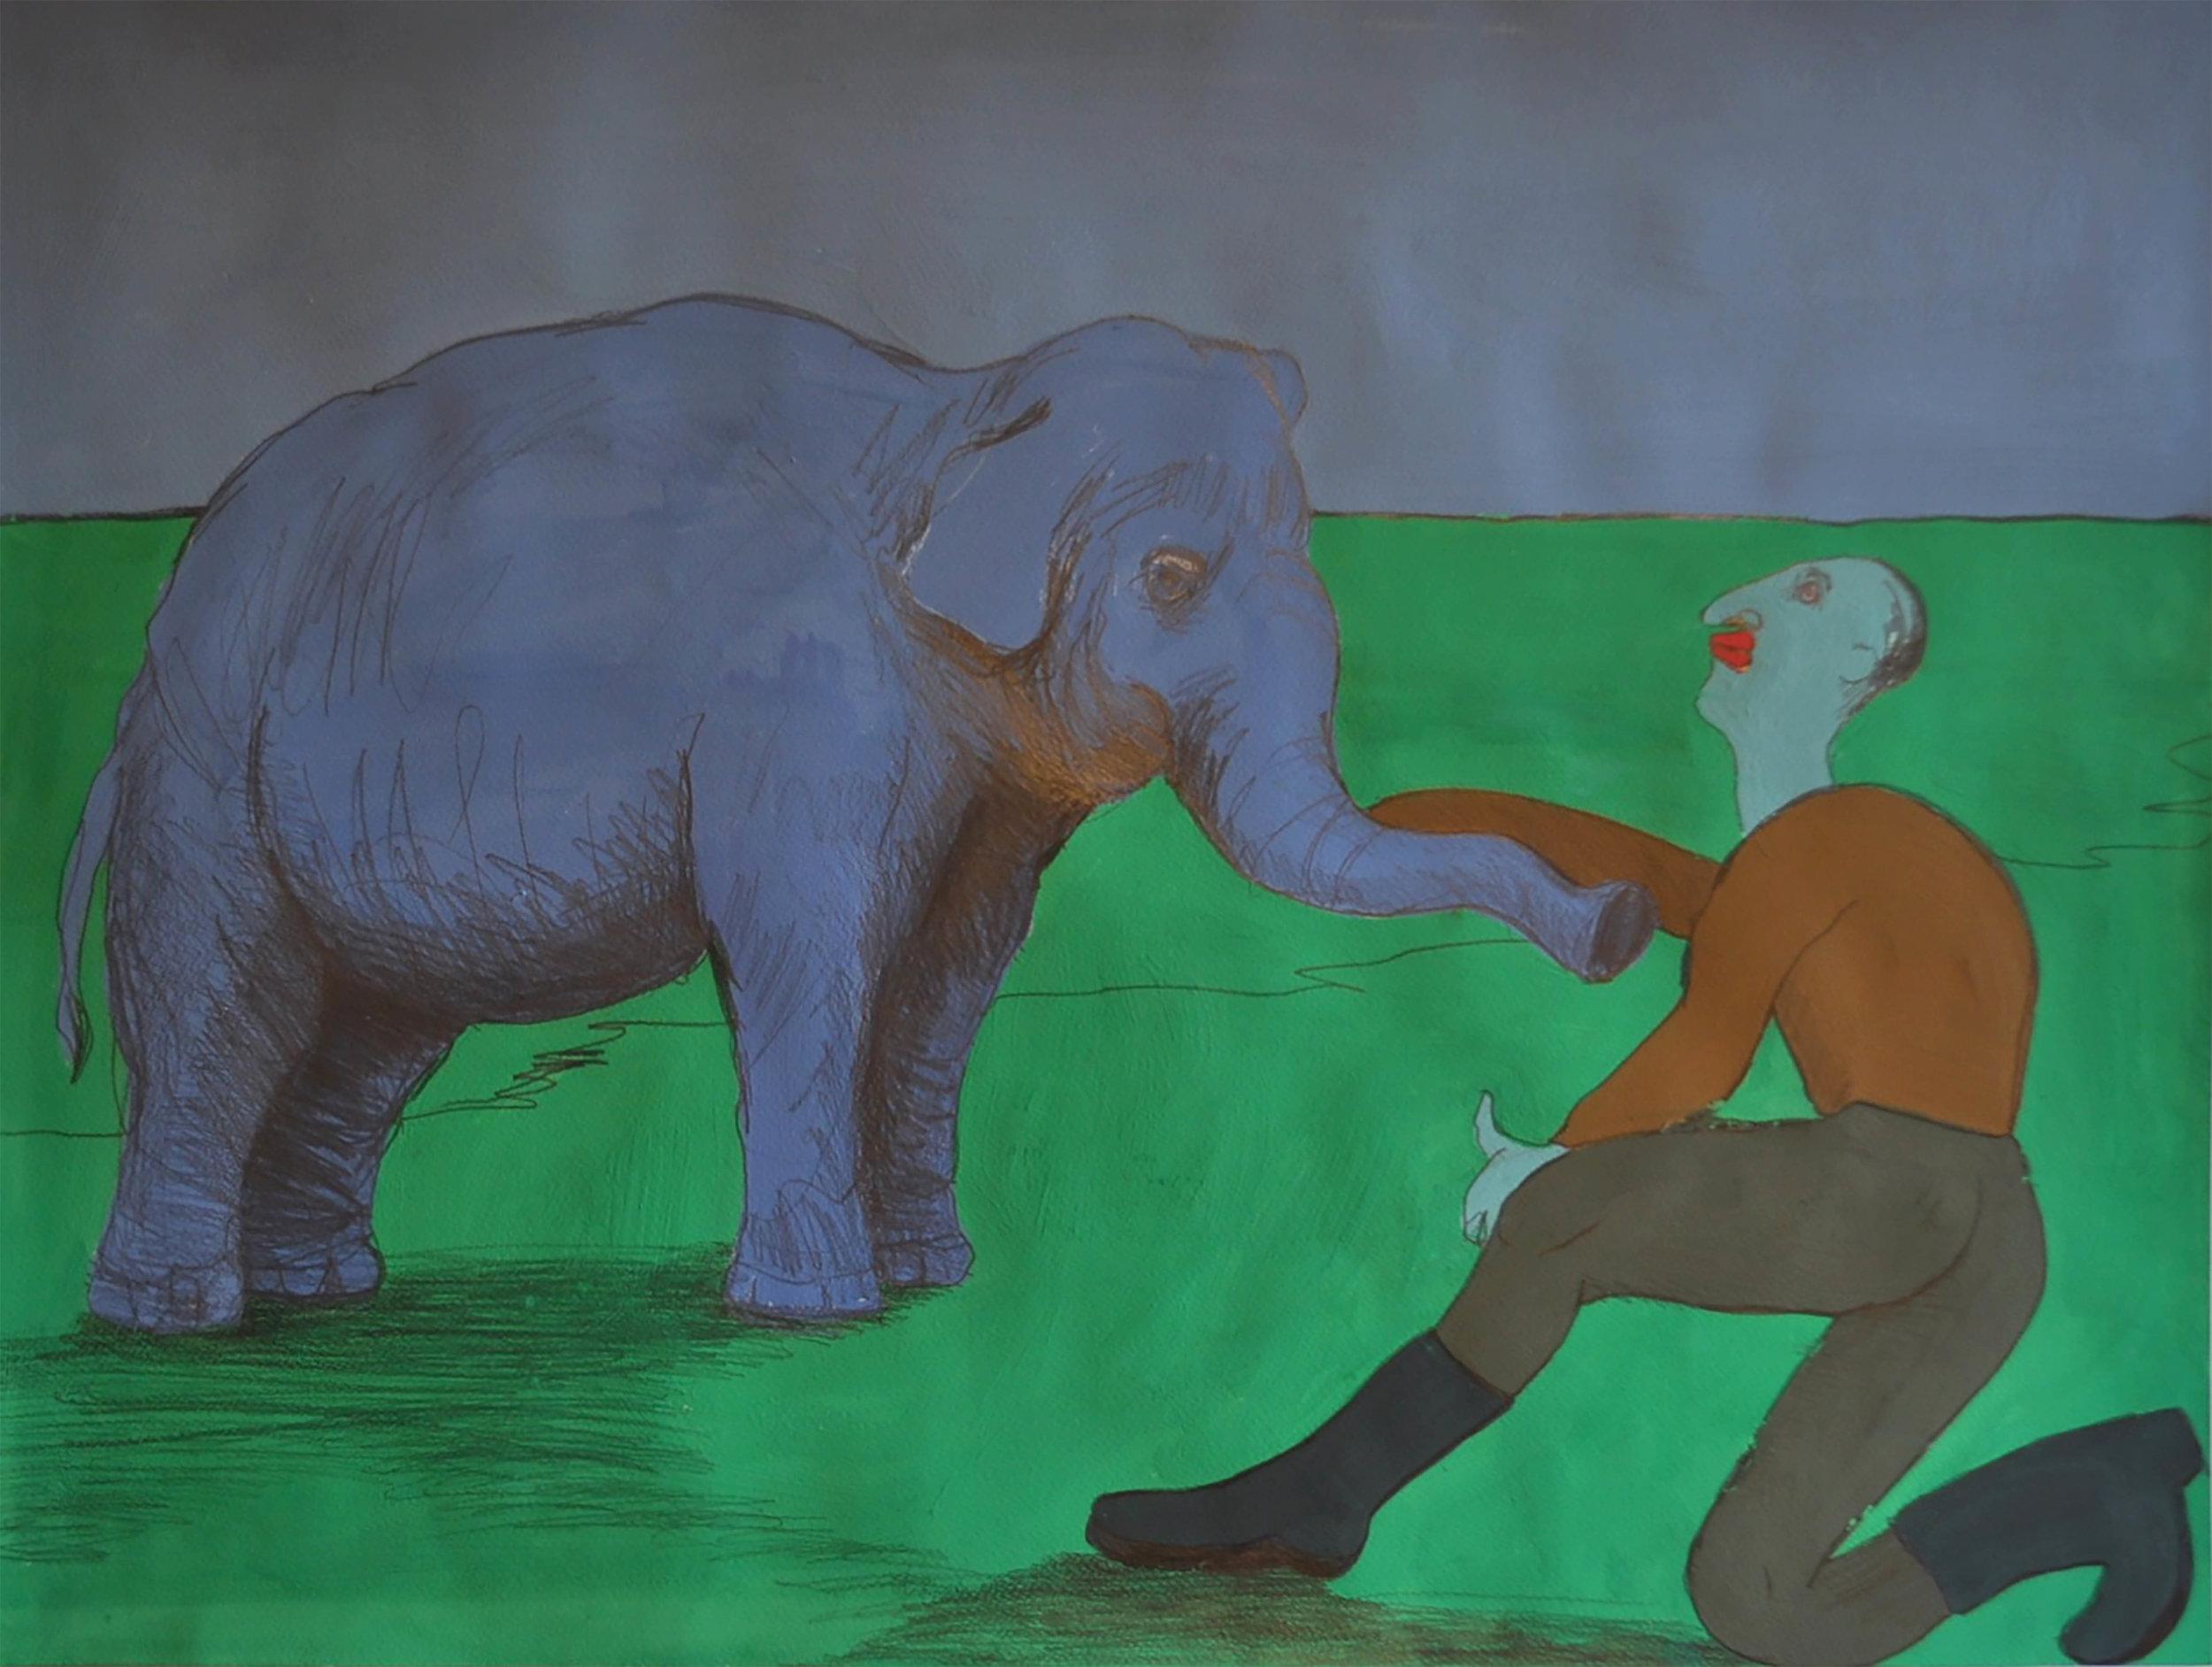 Bonaventura_Elephant_and_Trainer .jpg